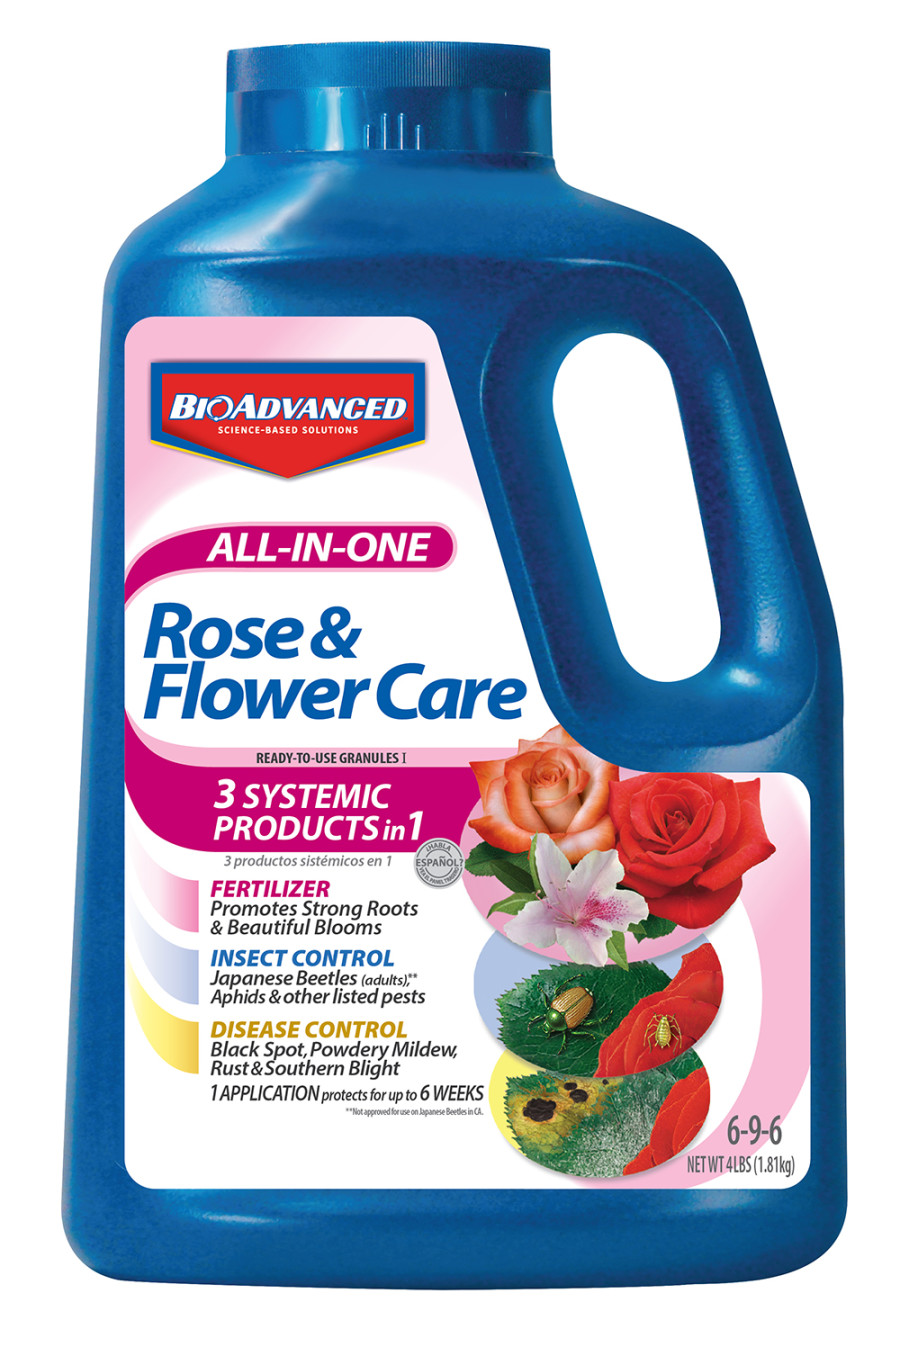 BioAdvanced All-In-One Rose & Flower Care Granules 6-9-6 Acephate 6ea/4 lb